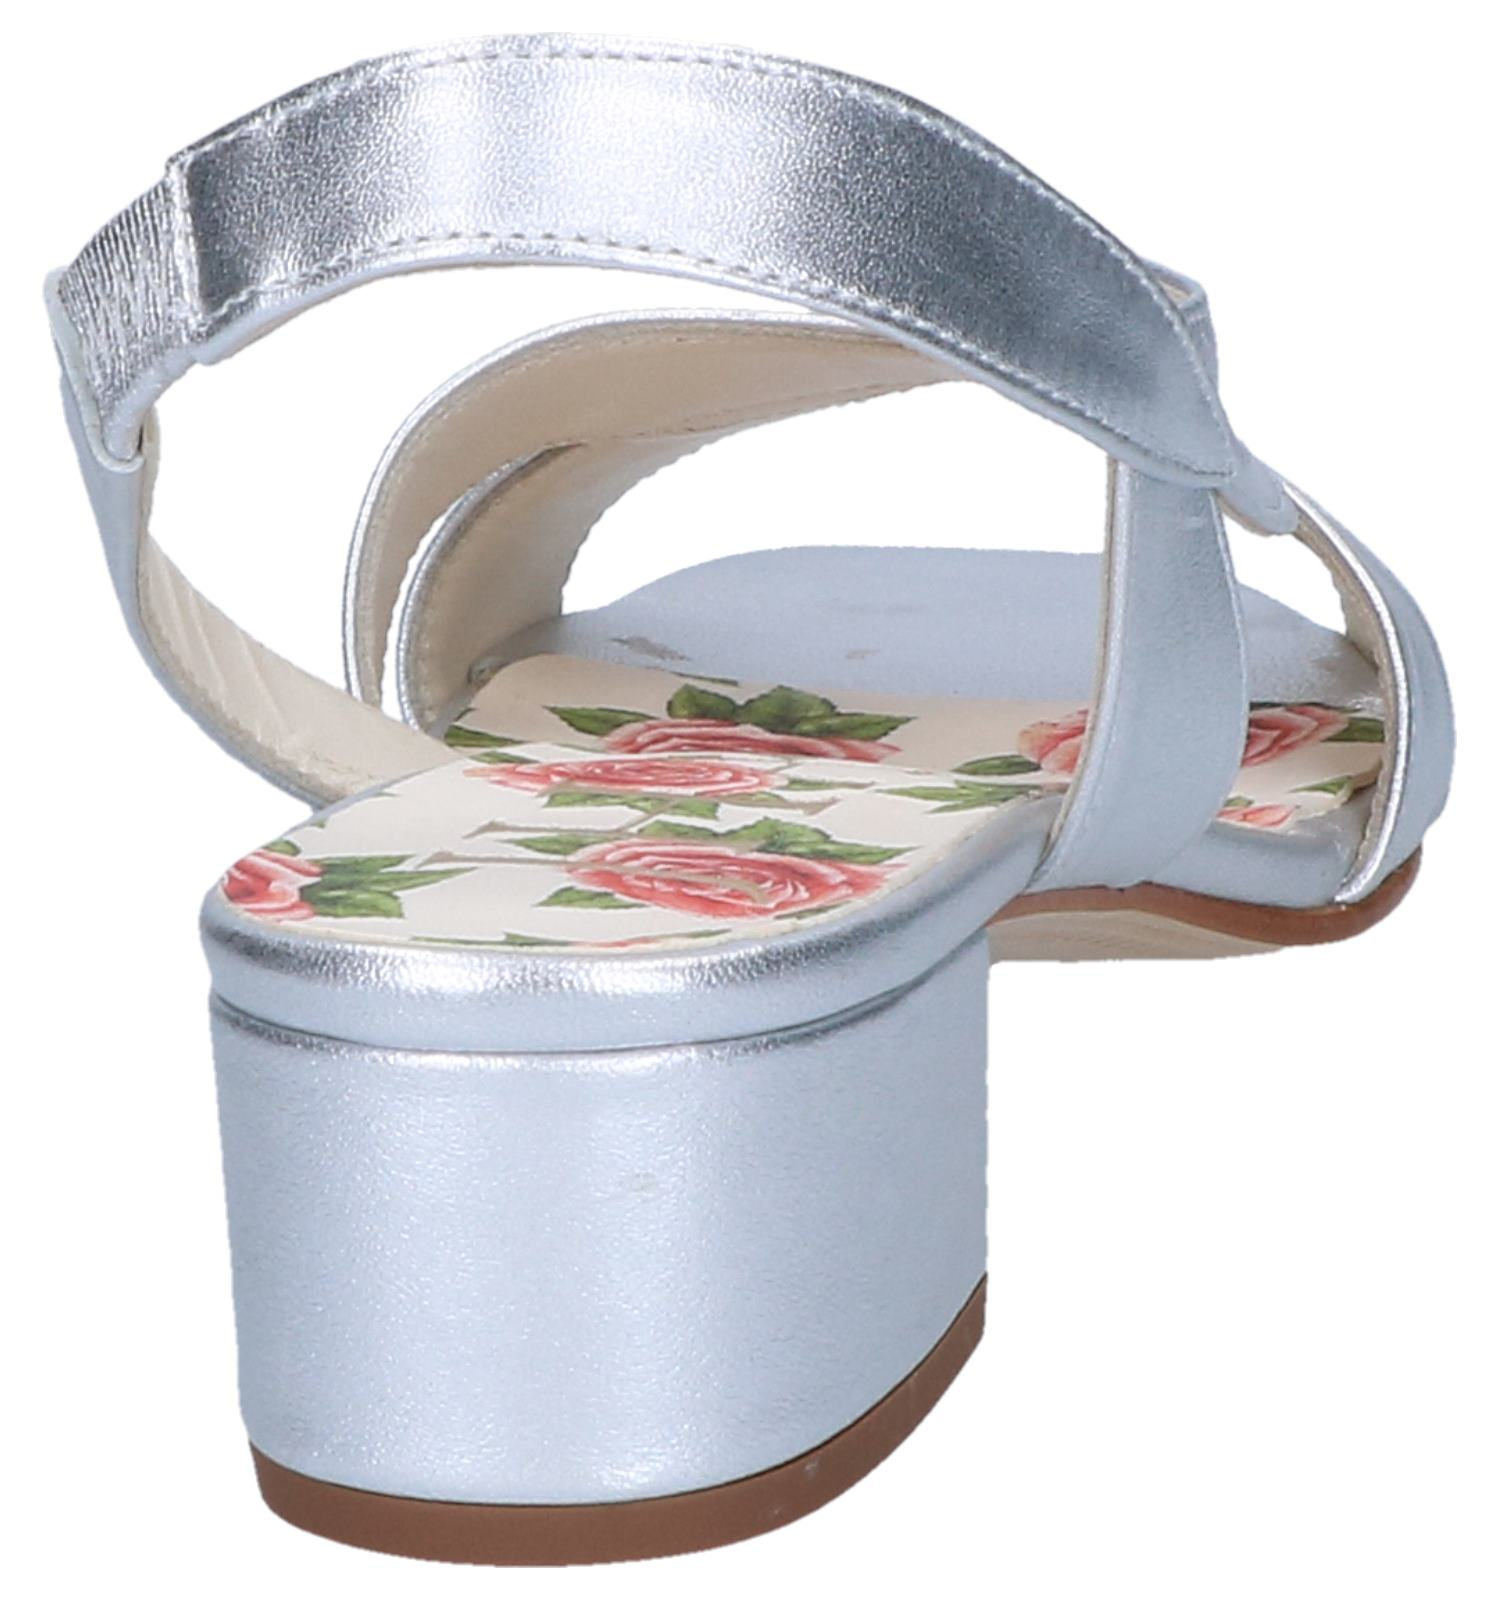 Jhay Zilveren Sandalen Zilveren Zilveren Sandalen Sandalen Zilveren Sandalen Jhay Jhay Jhay VpGUzMqS